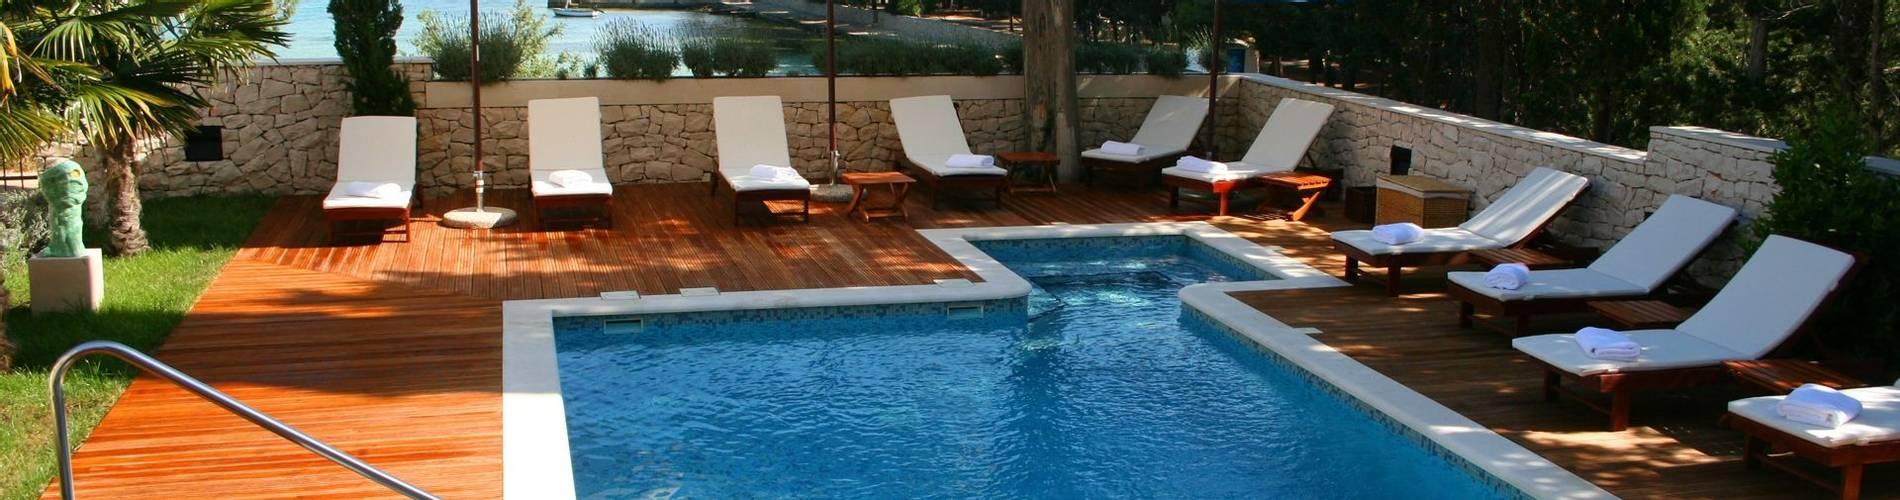 Villa pool3.jpg